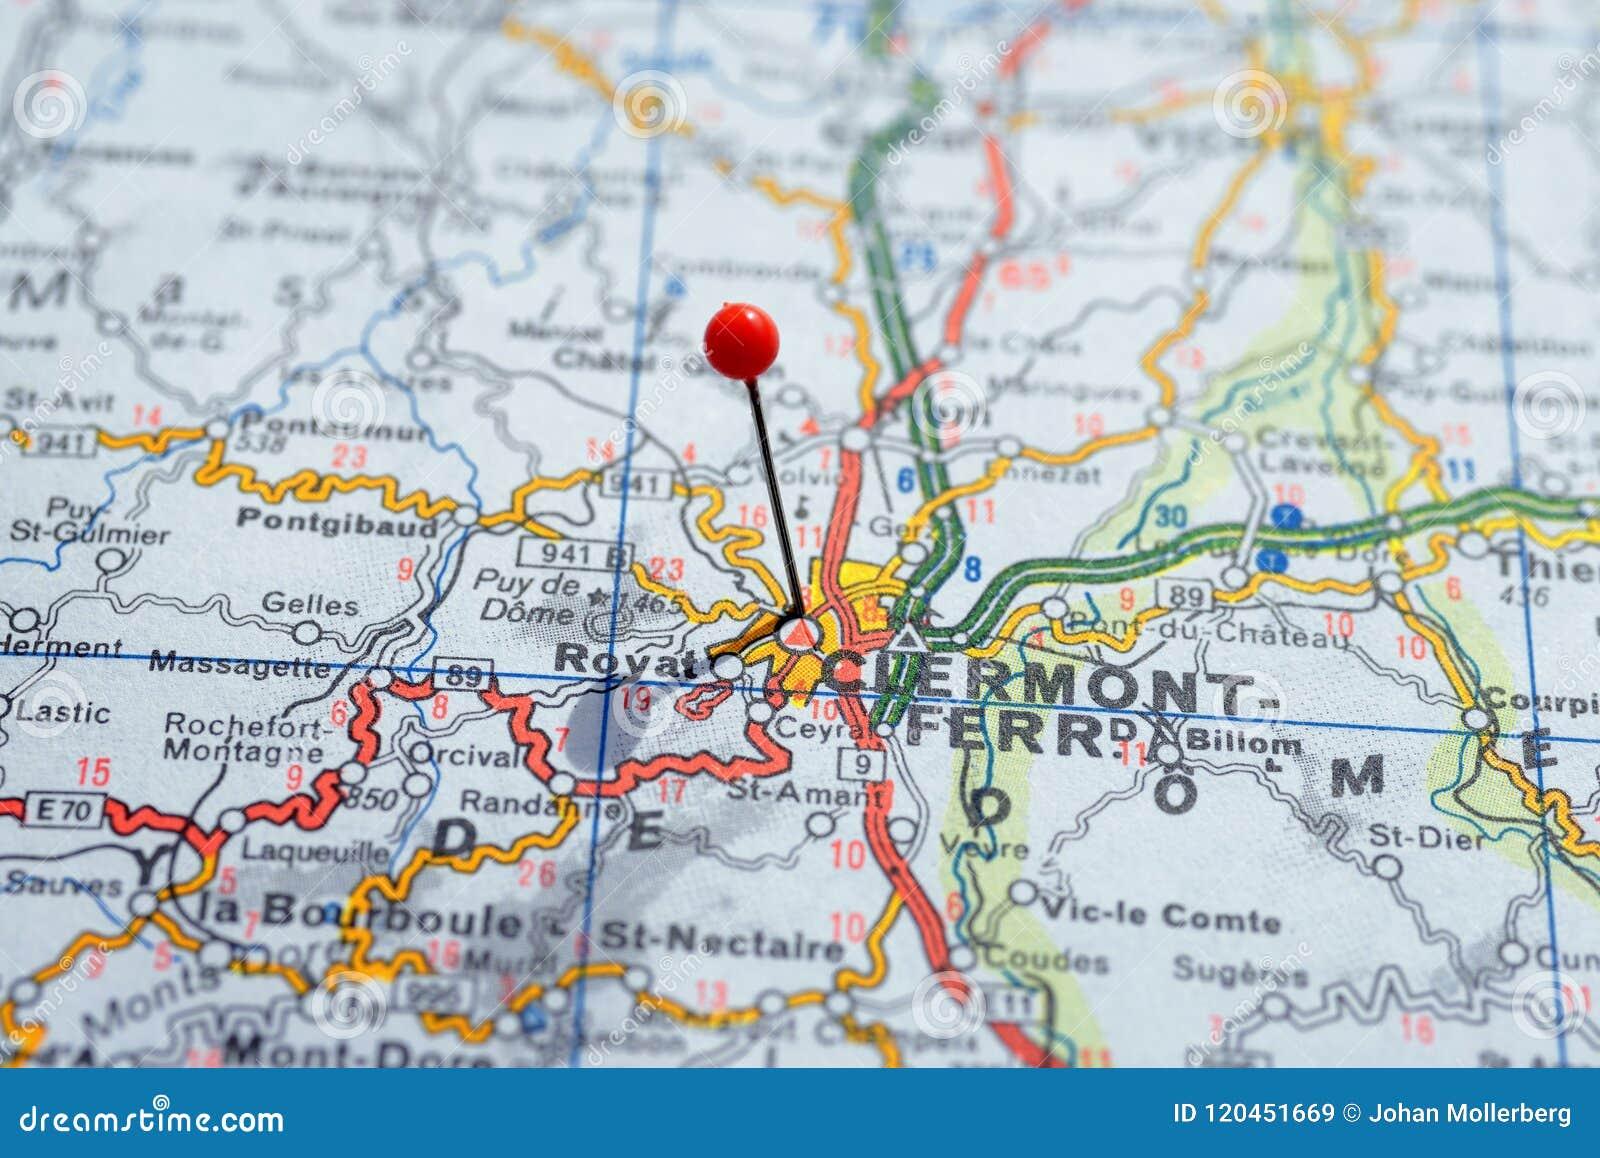 council of clermont map, munich map, saumur map, newcastle upon tyne map, le havre map, utrecht map, carcassonne map, london map, trieste map, cluj-napoca map, mont saint-michel map, boulogne-sur-mer map, seine map, rennes map, cahors map, vila nova de gaia map, turku map, arras map, evian-les-bains map, strasbourg map, on clermont ferrand map